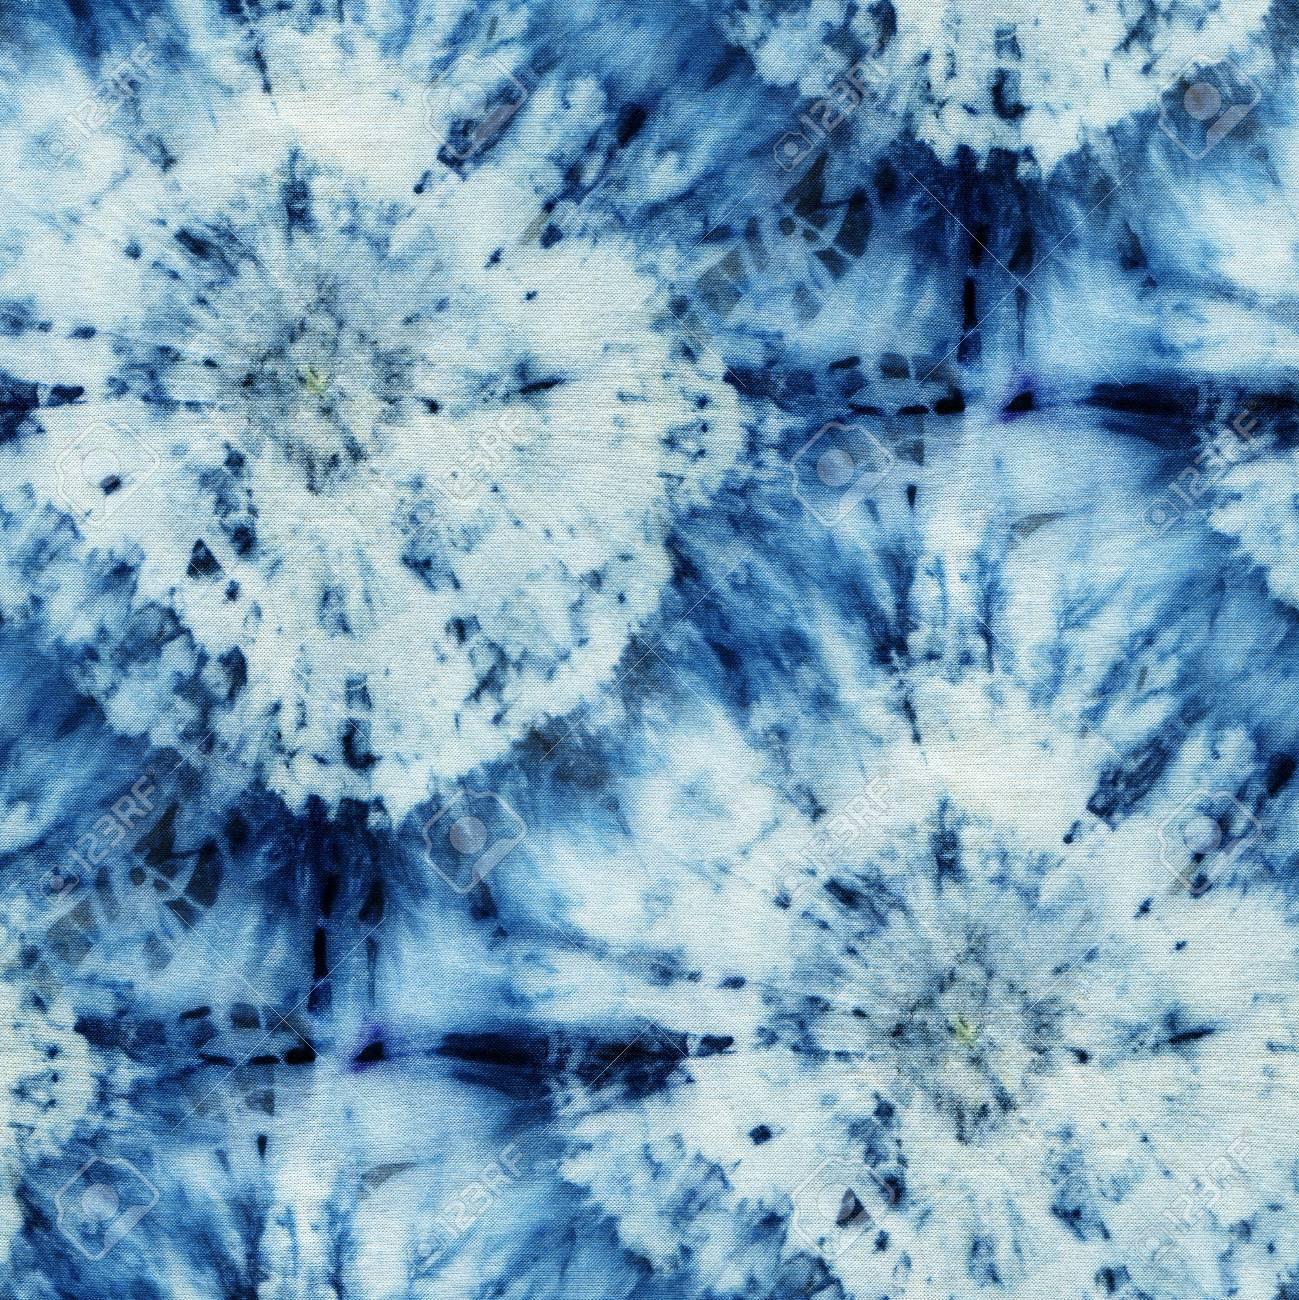 Tie Dye T Shirt Pattern Stock Photos Freeimages Com